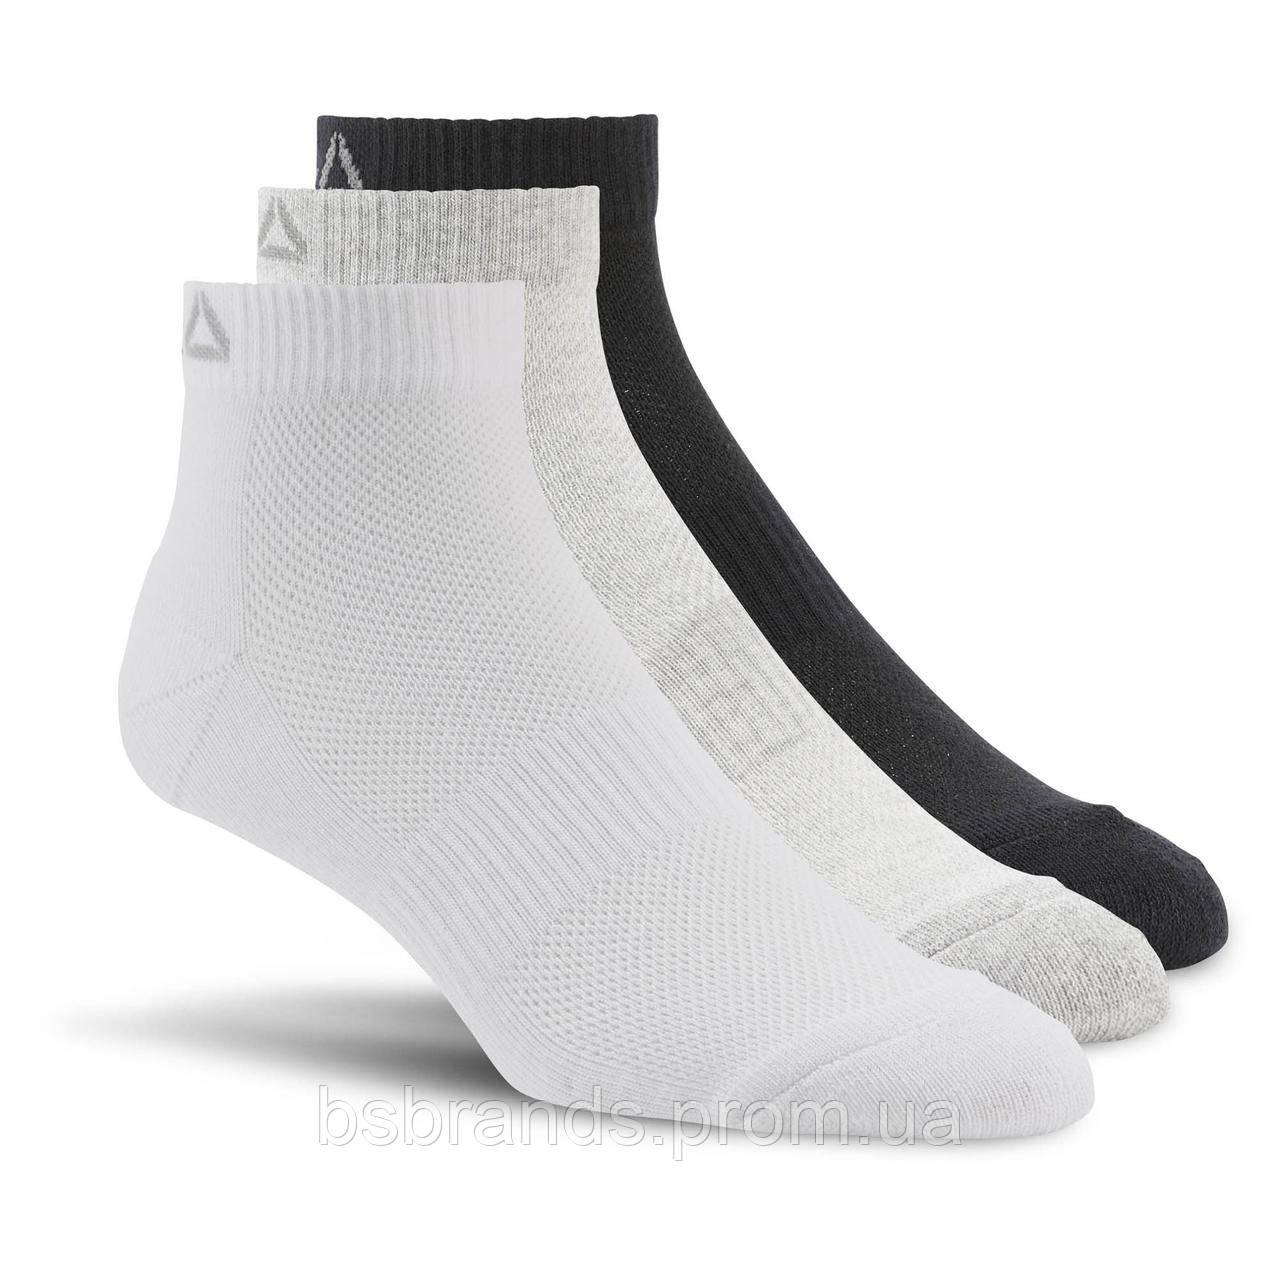 Спортивные носки Reebok (3 пары) AJ6250 (2020/1)